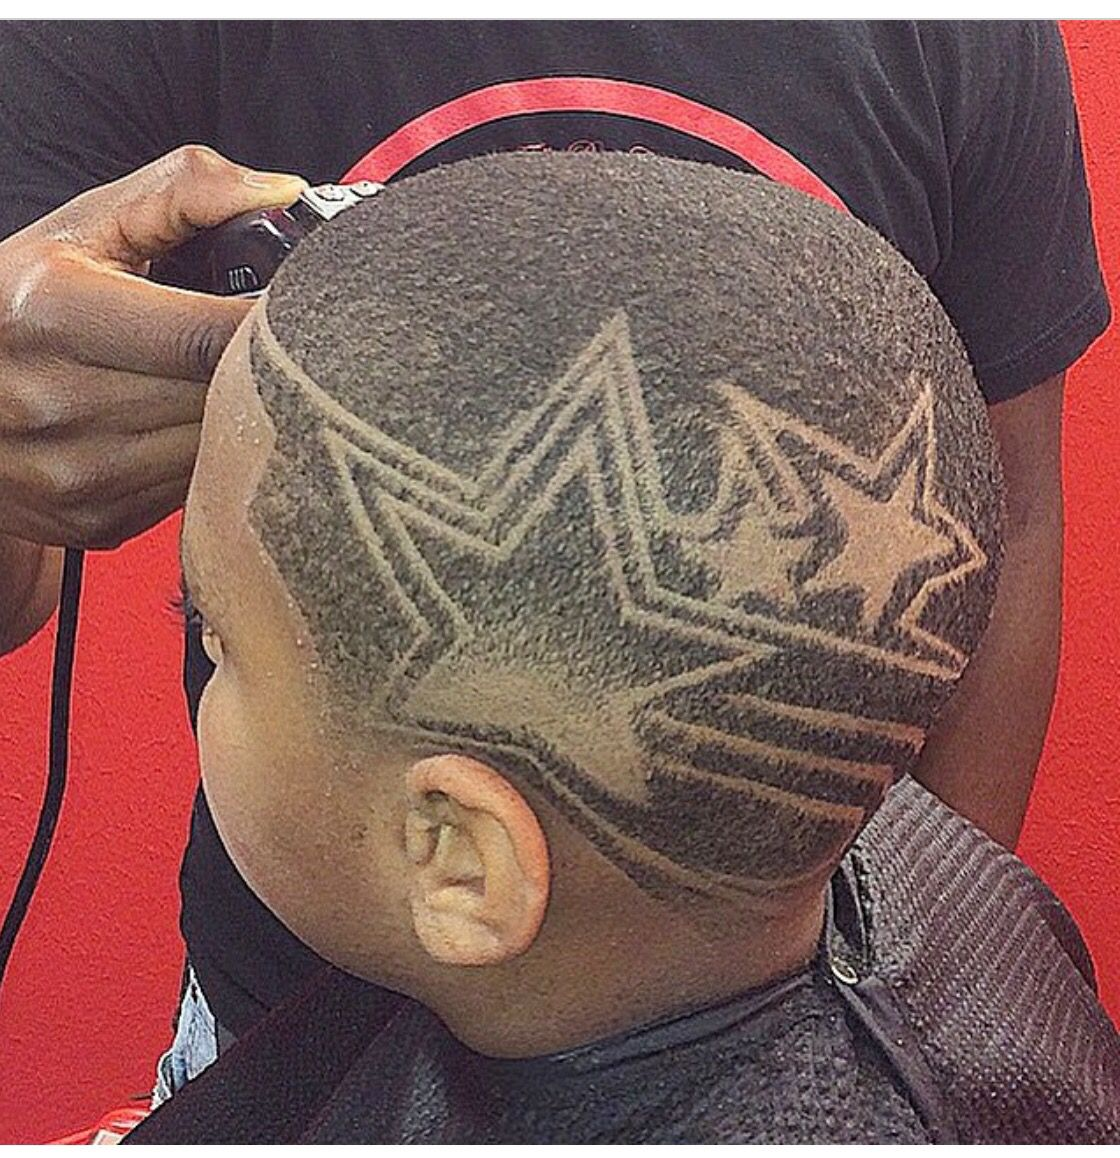 Black men haircut styles chart dimanche arnel dimanchearnel on pinterest